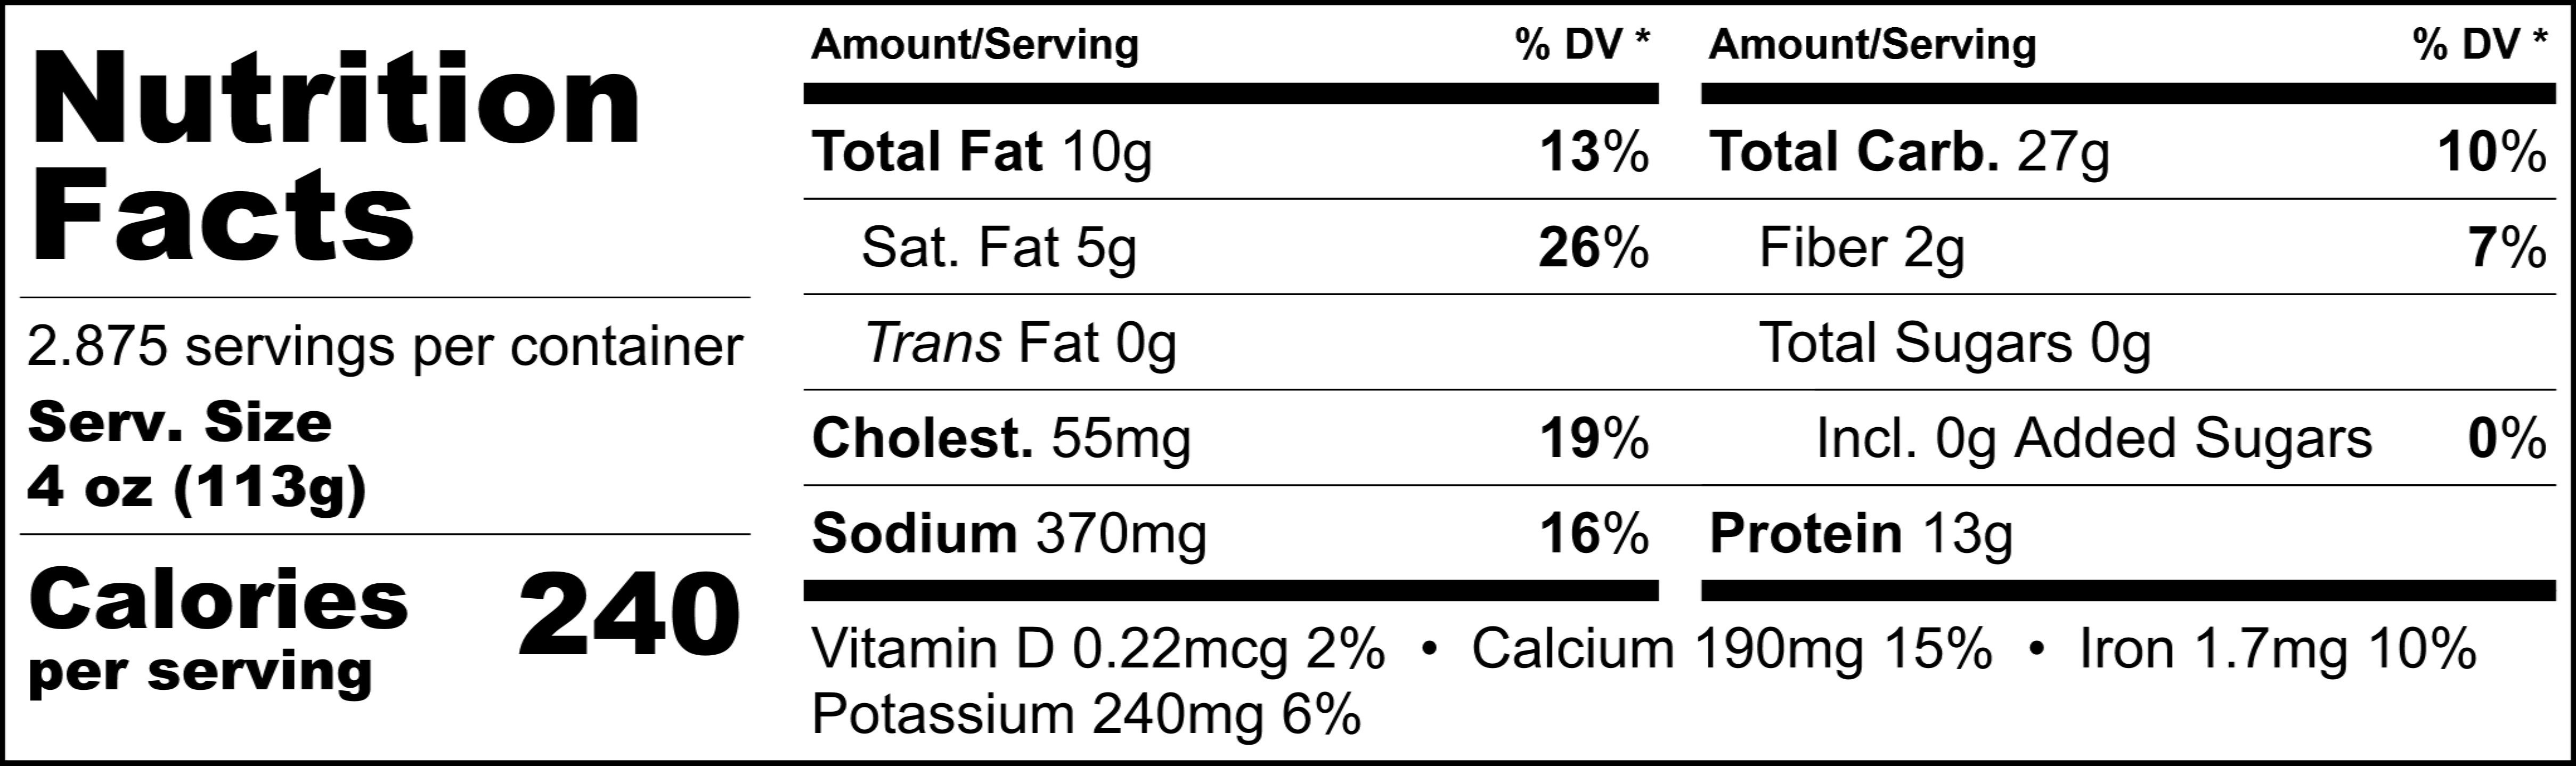 Mountain_Asparagus_Ravioli_1.3.17_RecipeFormula_Nutrition_Label.jpg